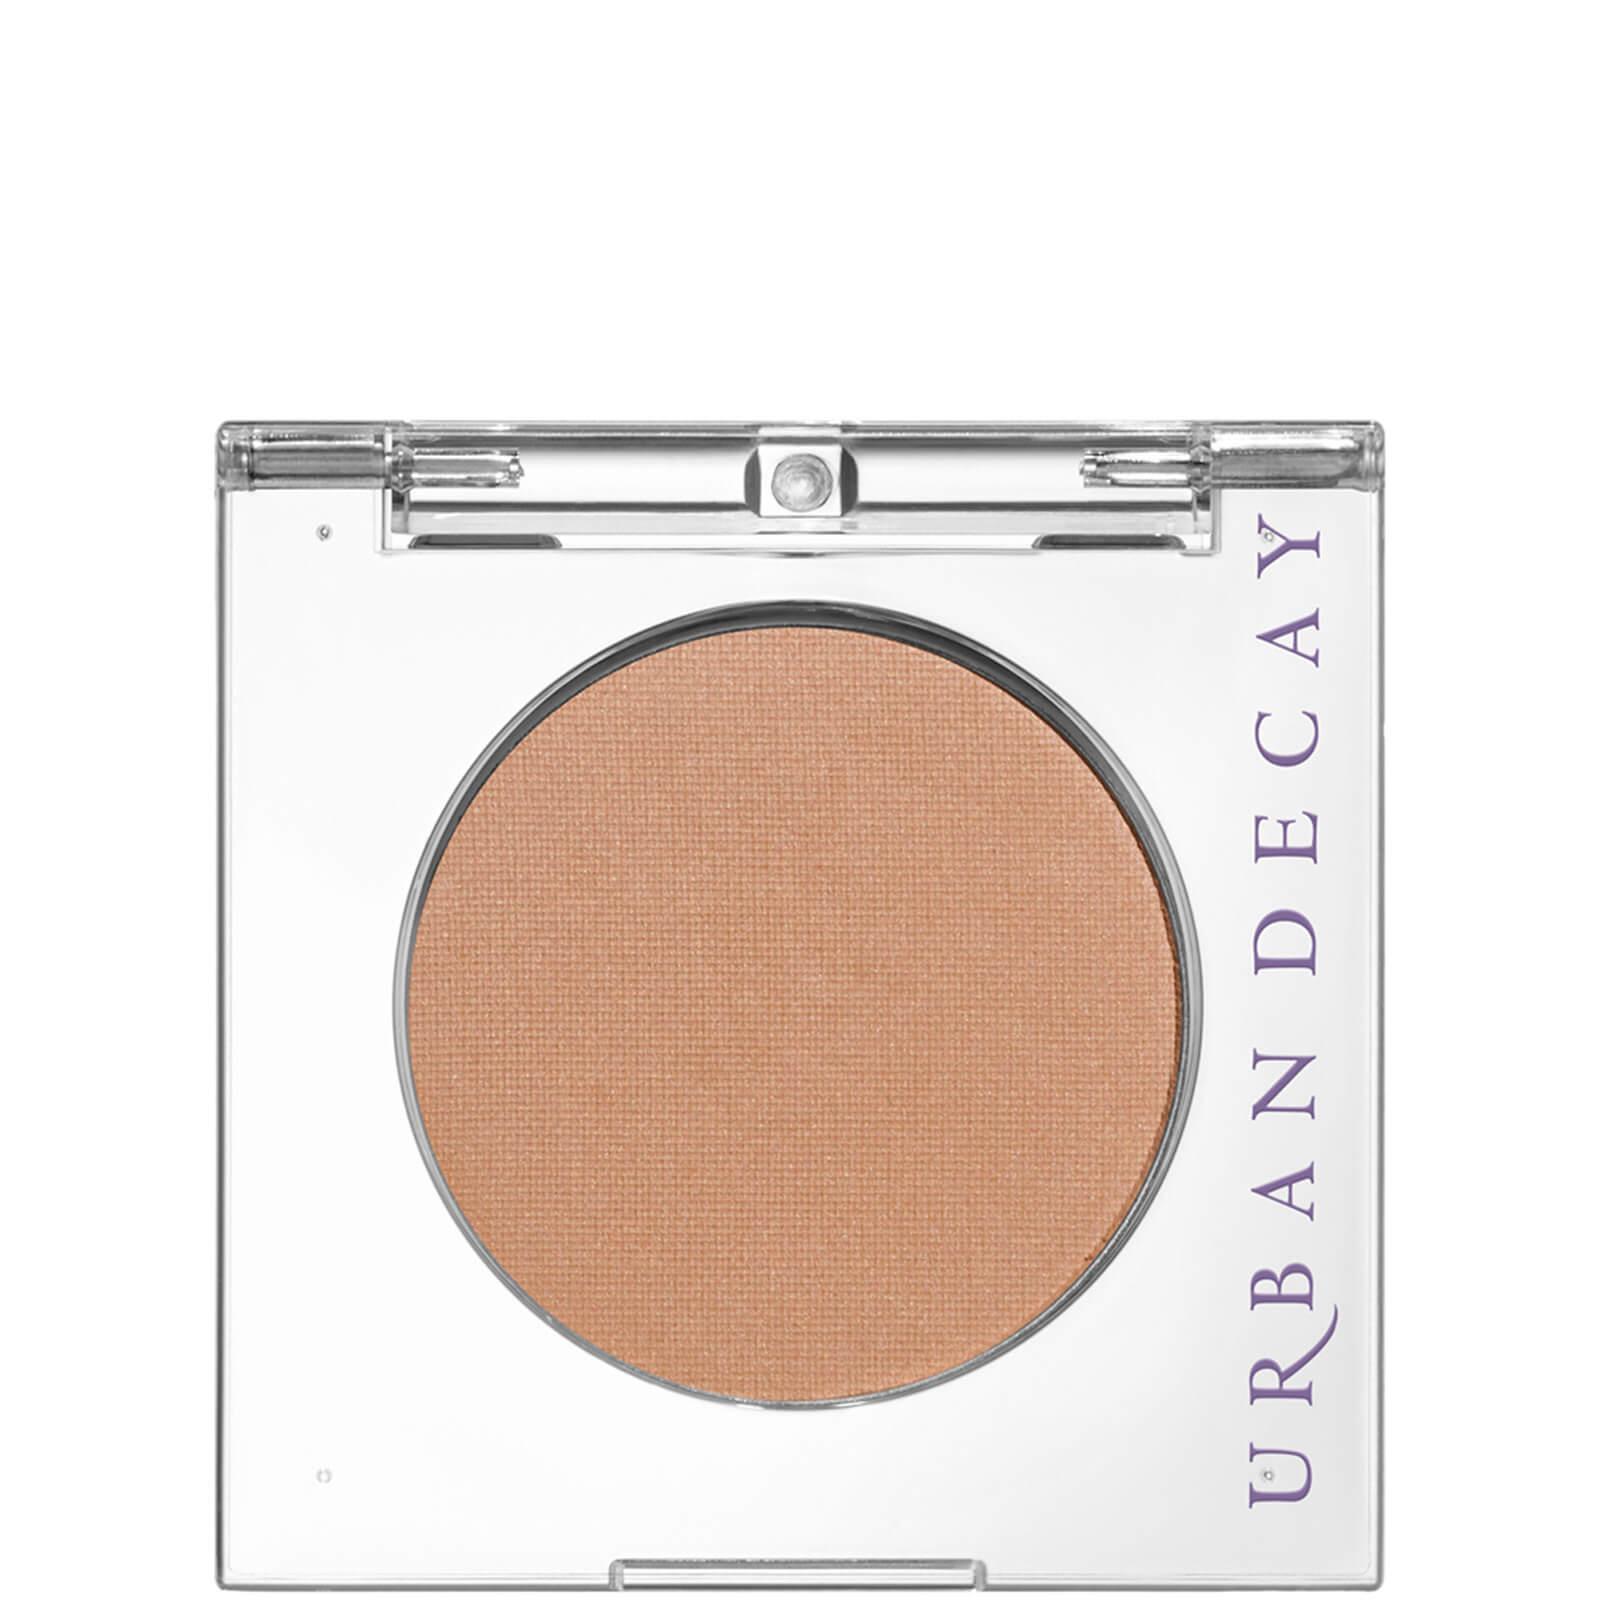 Купить Urban Decay 24/7 Eyeshadow Mono Moondust (Various Shades) - Fiz